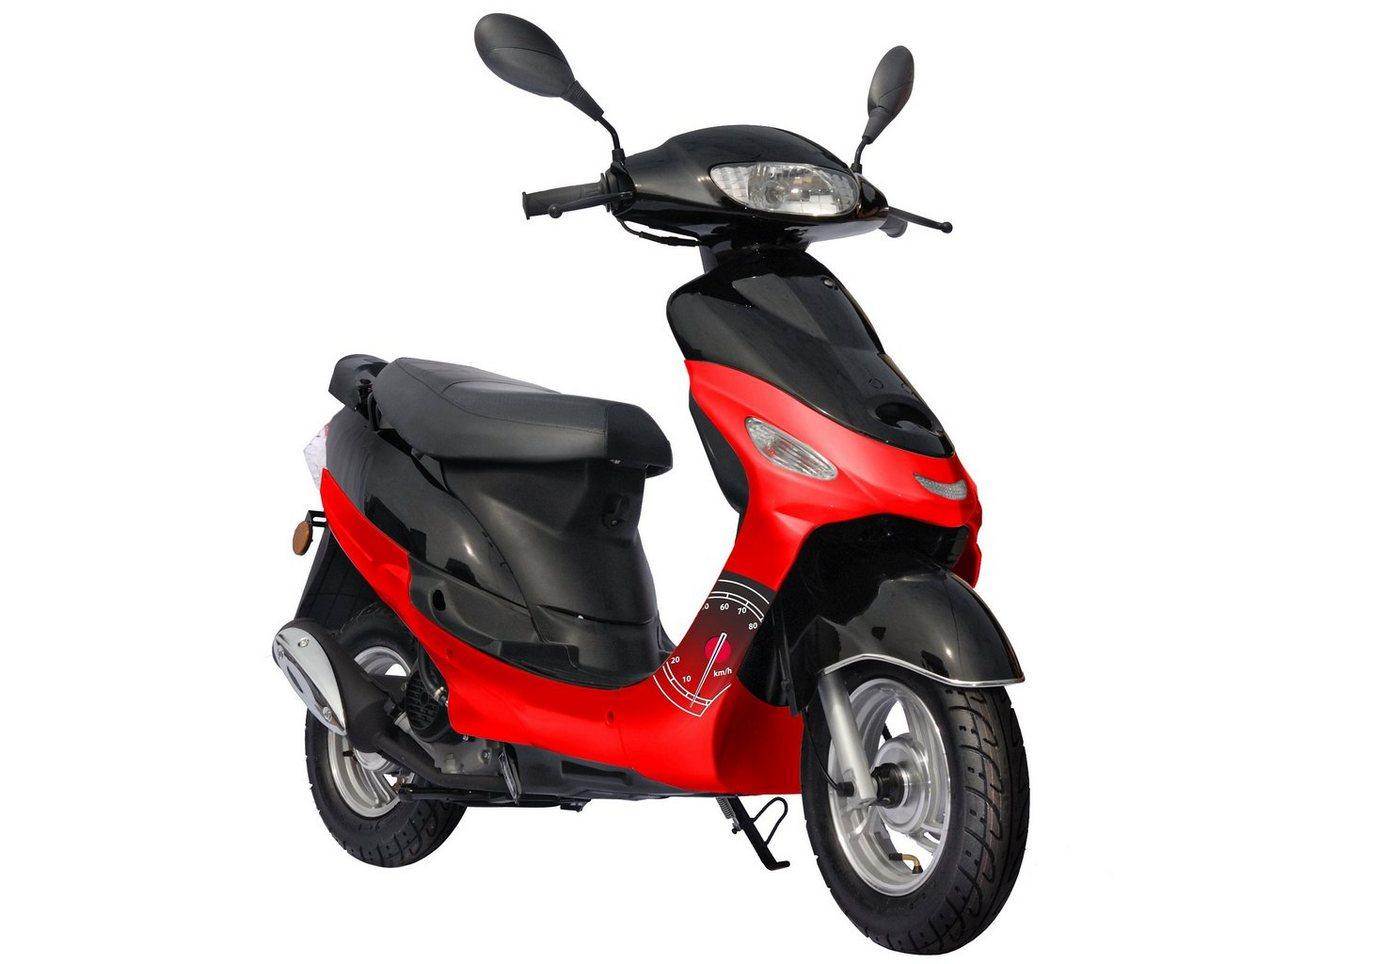 Nova Motors Mofaroller inkl. Spiegel, Nova Motors, »Eco Fox«, 50 ccm 25 km/h, silber-schwarz oder rot-schwarz